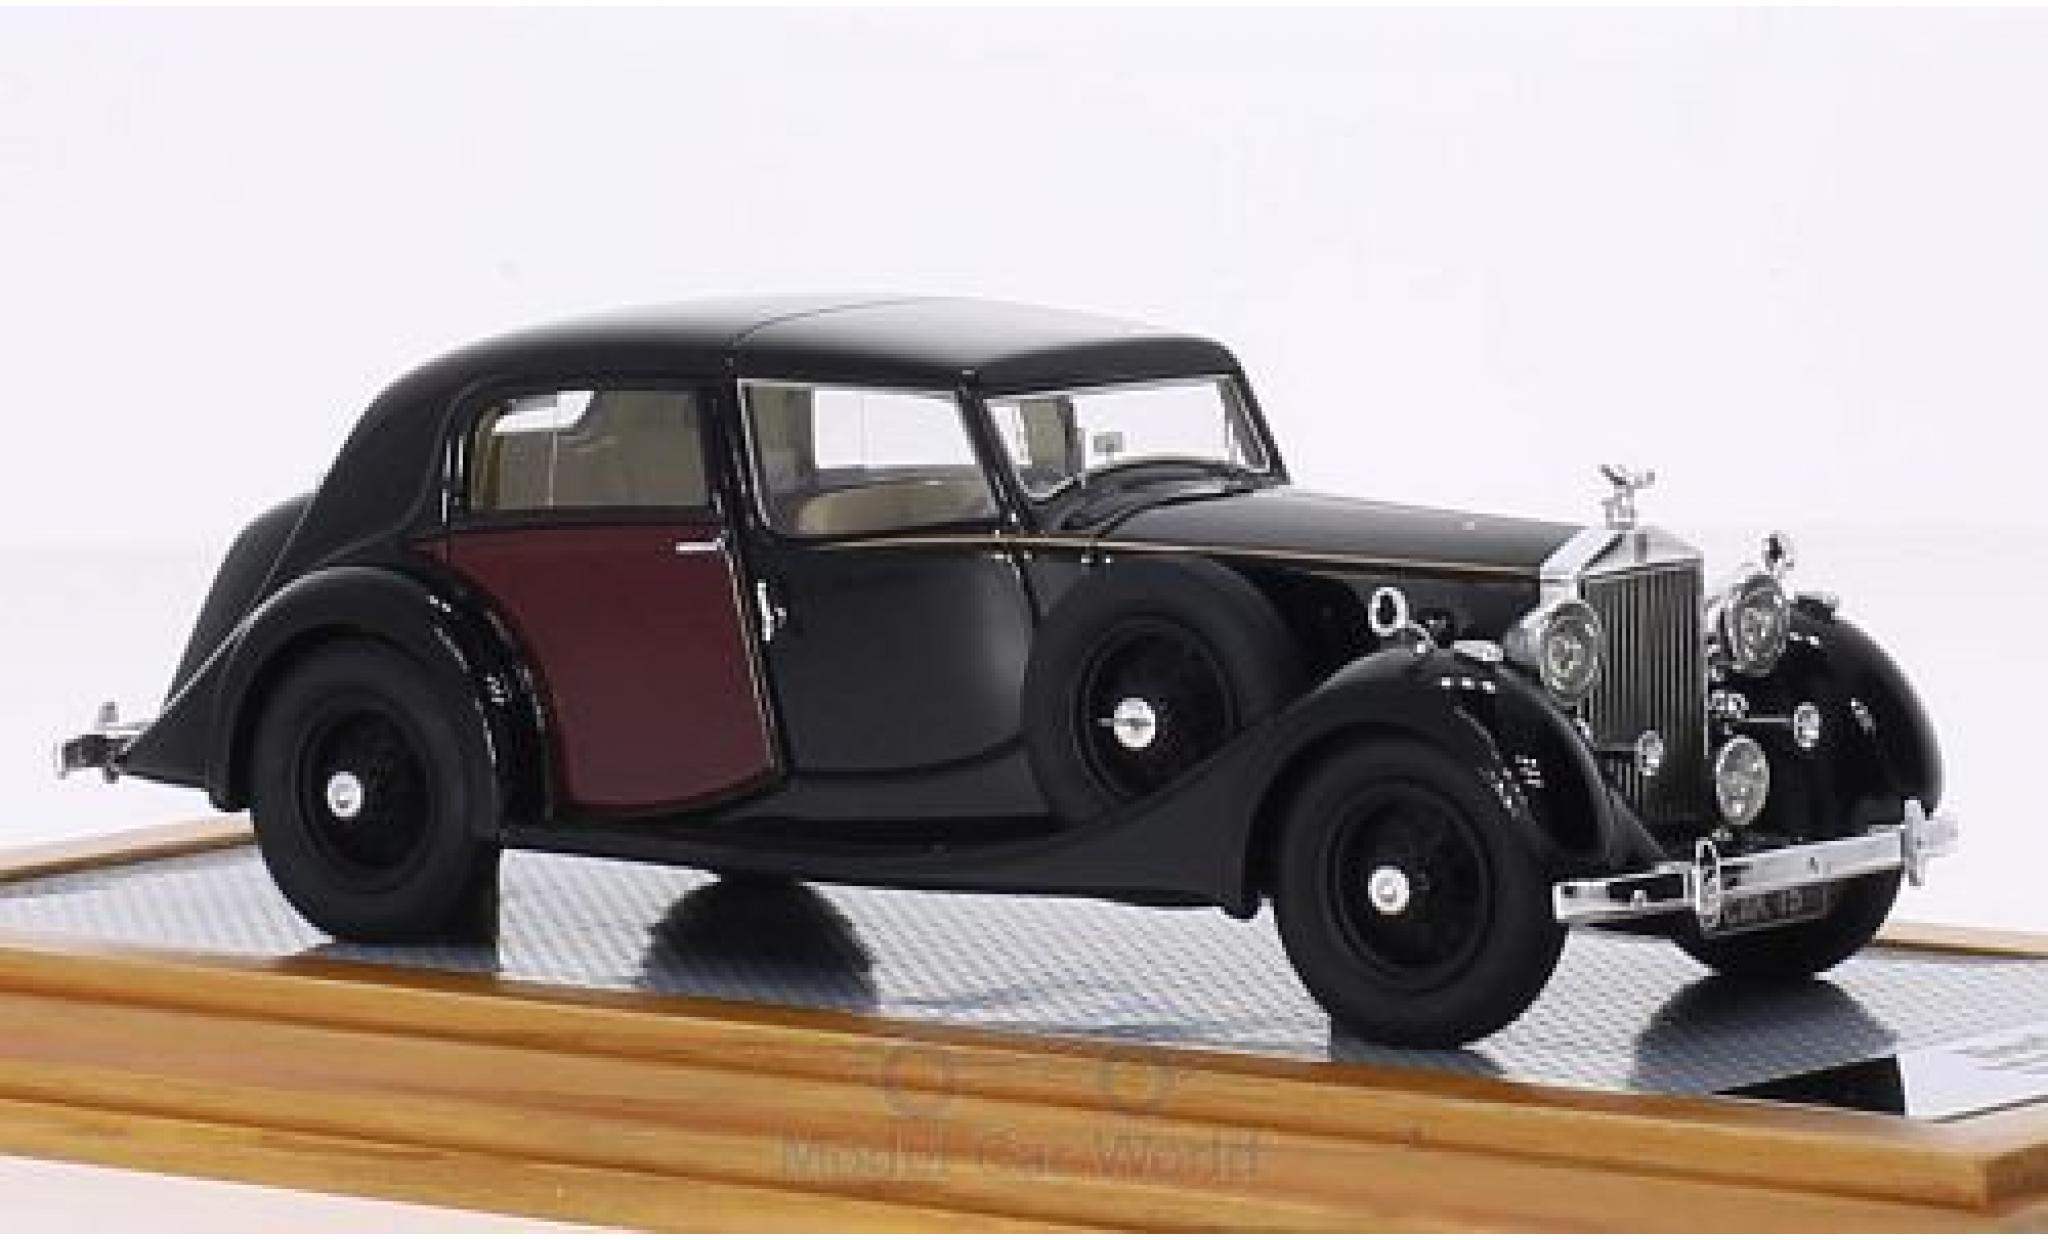 Rolls Royce Phantom 1/43 Ilario III Sedanca de Ville Park Ward noire/rouge RHD 1937 sn3CP192